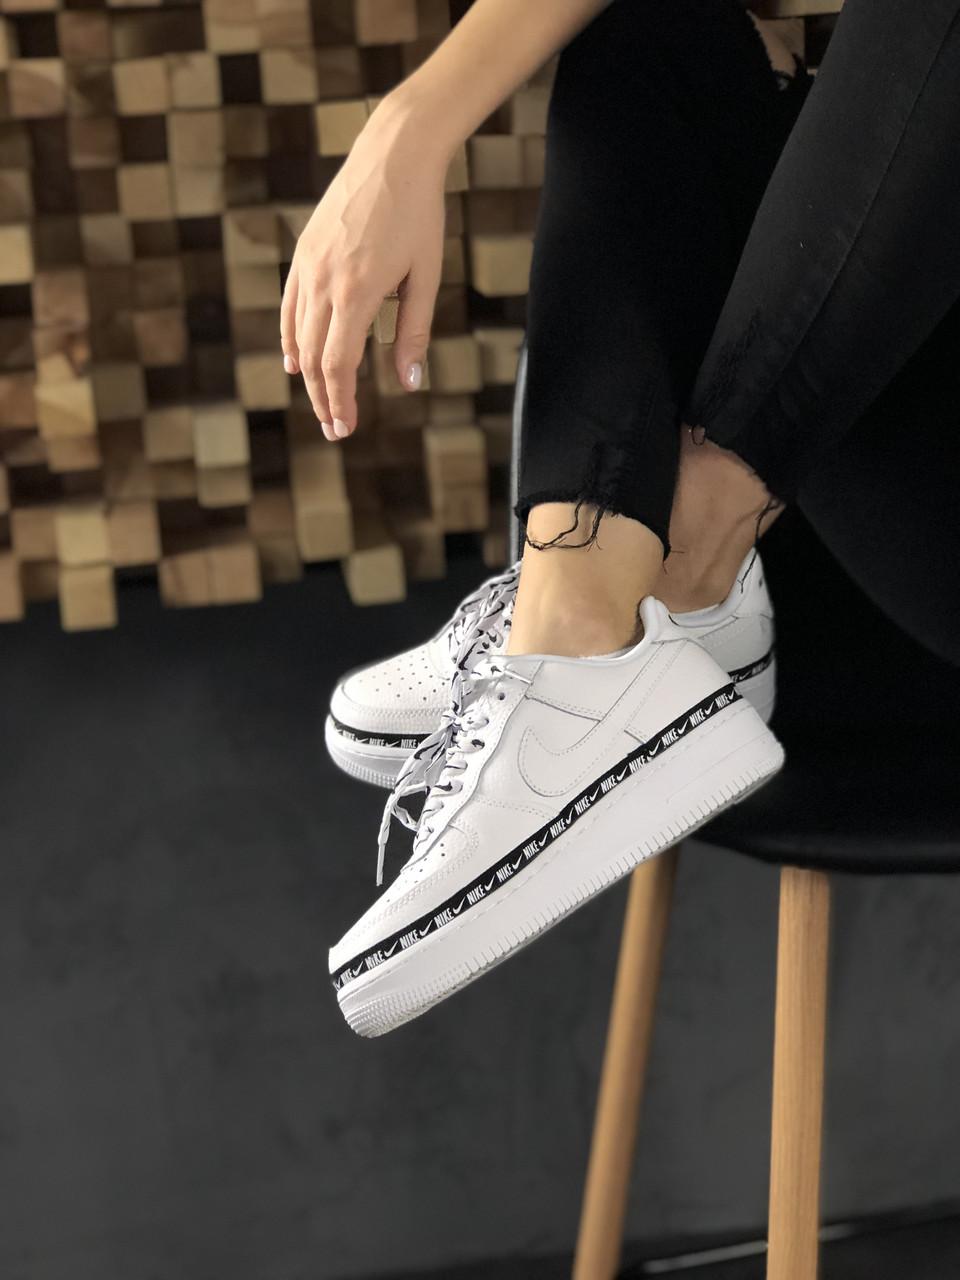 Кроссовки Nike Air Force 1 '07 Low SE Premium White Black 6